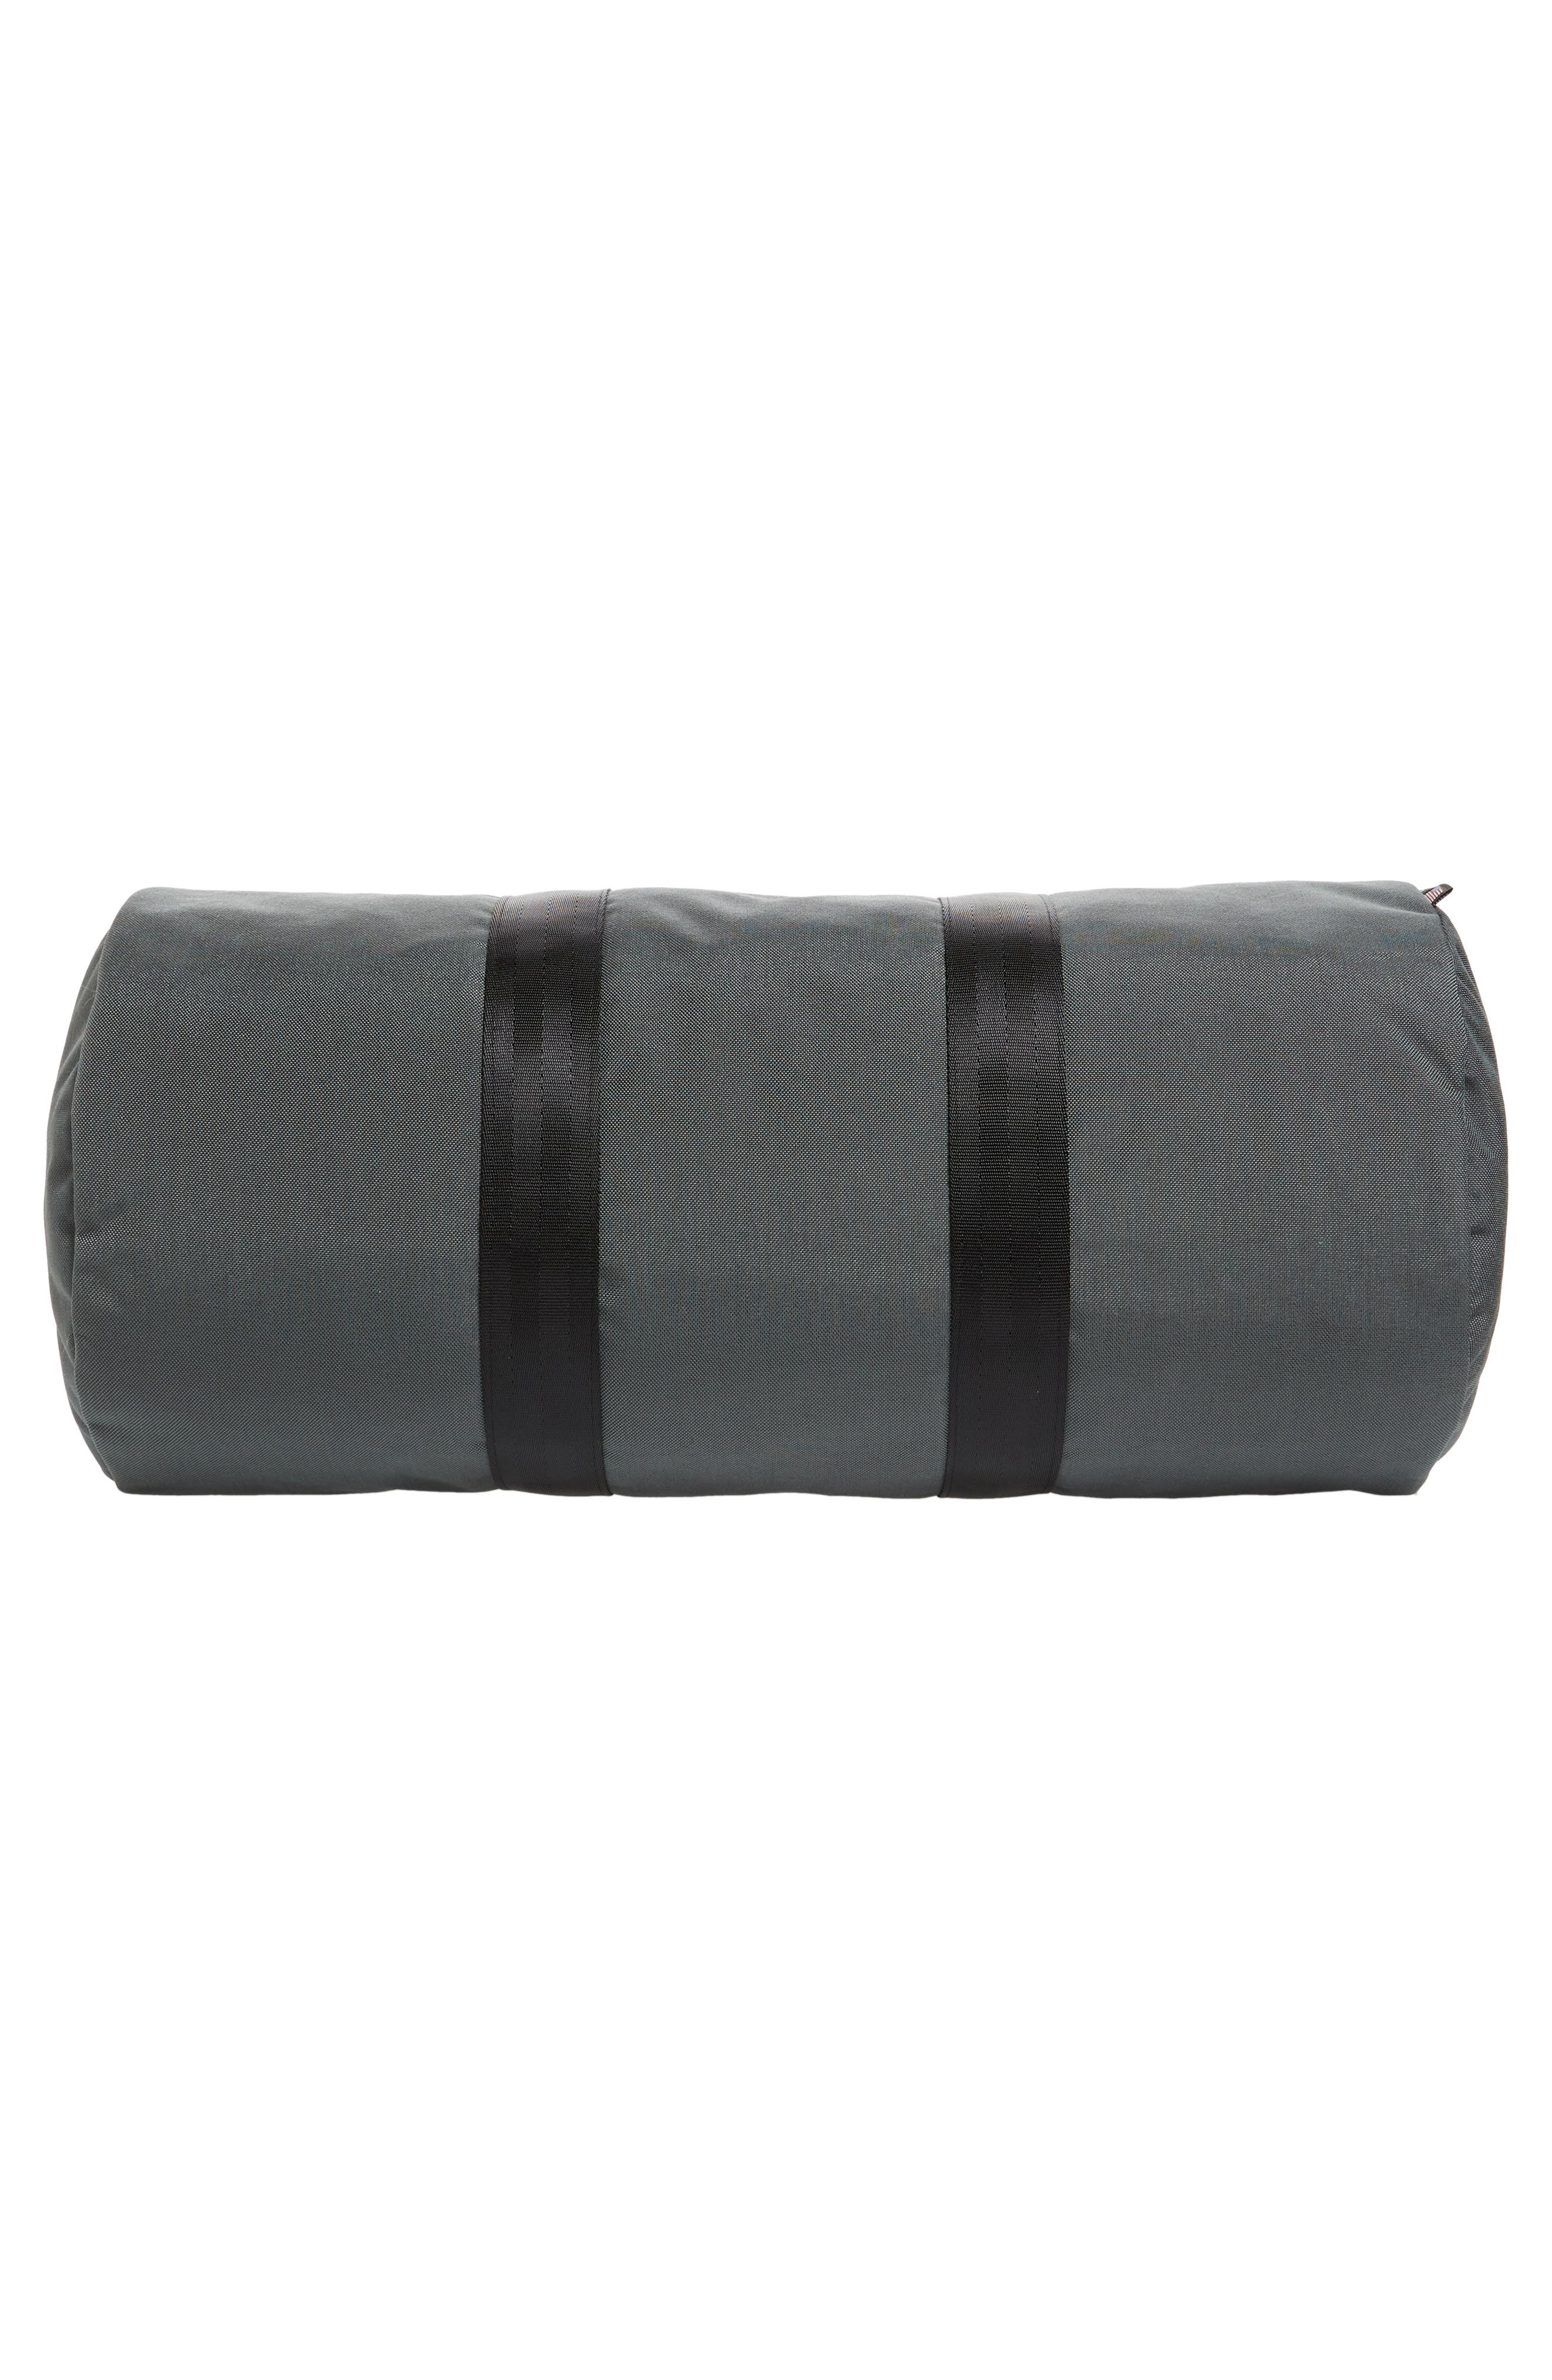 Classic Duffel Bag,                             Alternate thumbnail 6, color,                             CHARCOAL